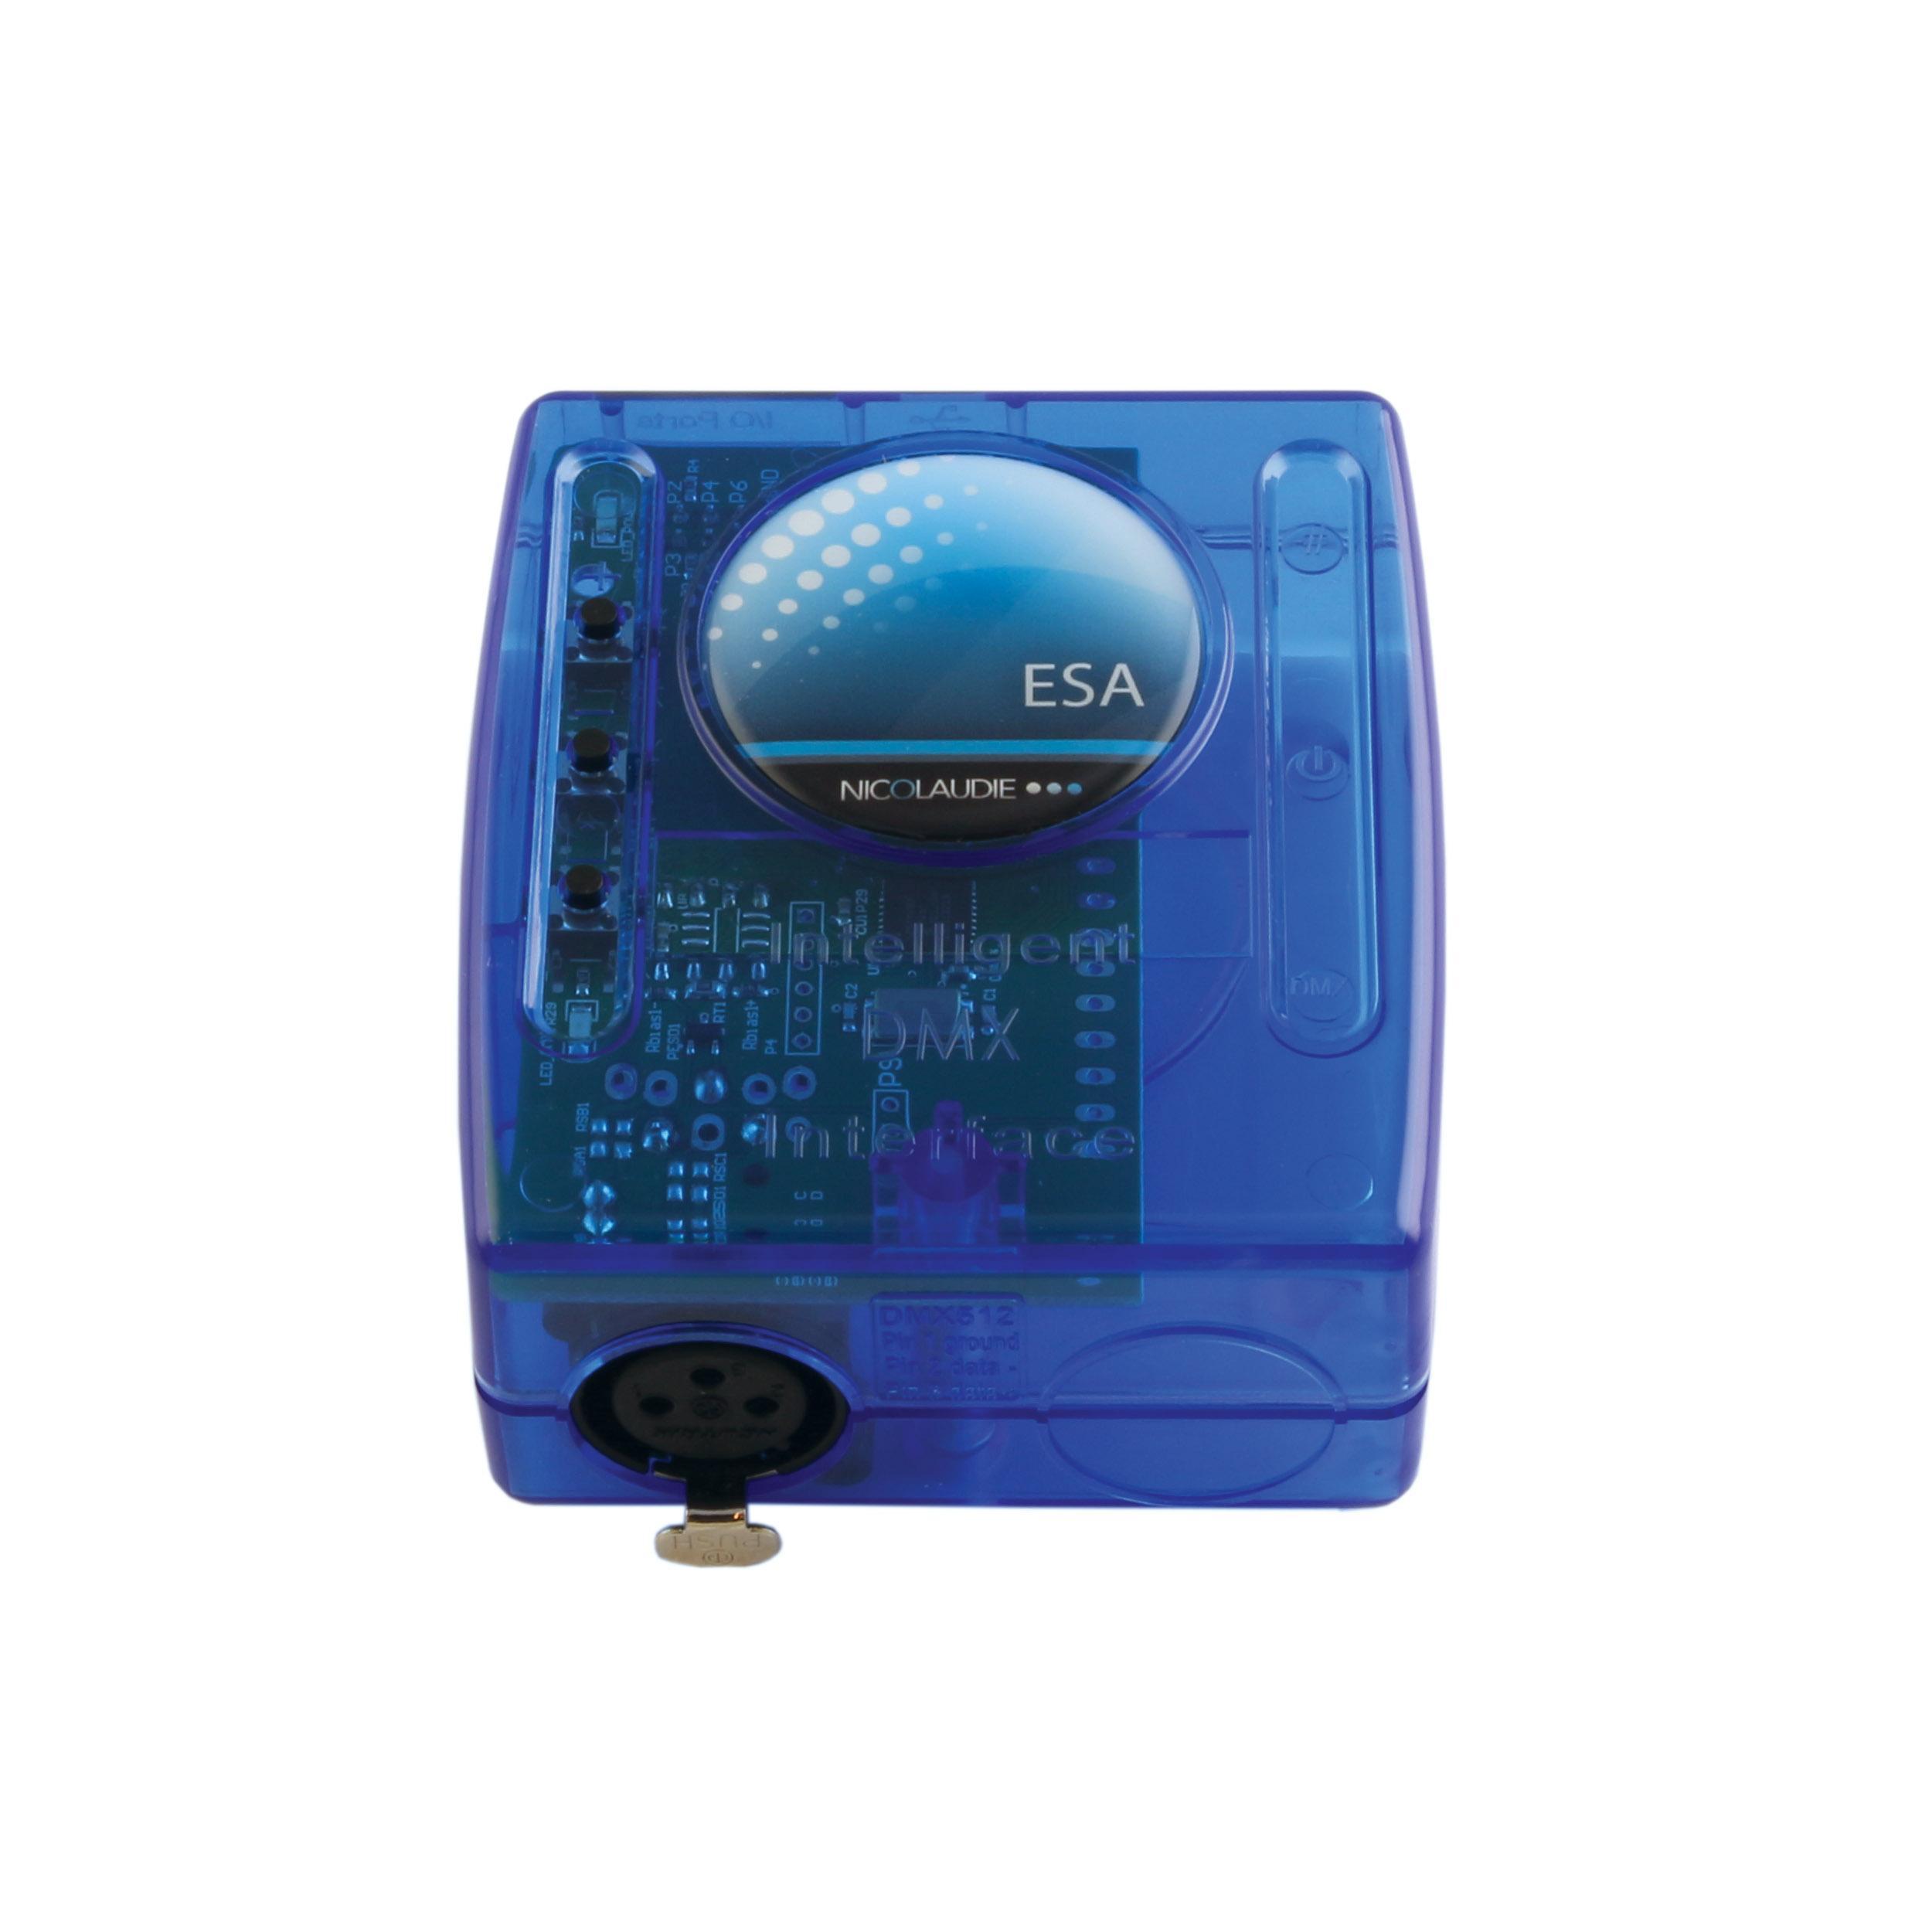 Armacost Lighting Rgb Led Custom Color Lighting Controller LedArmacost Lighting Rgb Led Custom Color Lighting Controller  . Armacost 21 Color Rgb Led Lighting Controller. Home Design Ideas